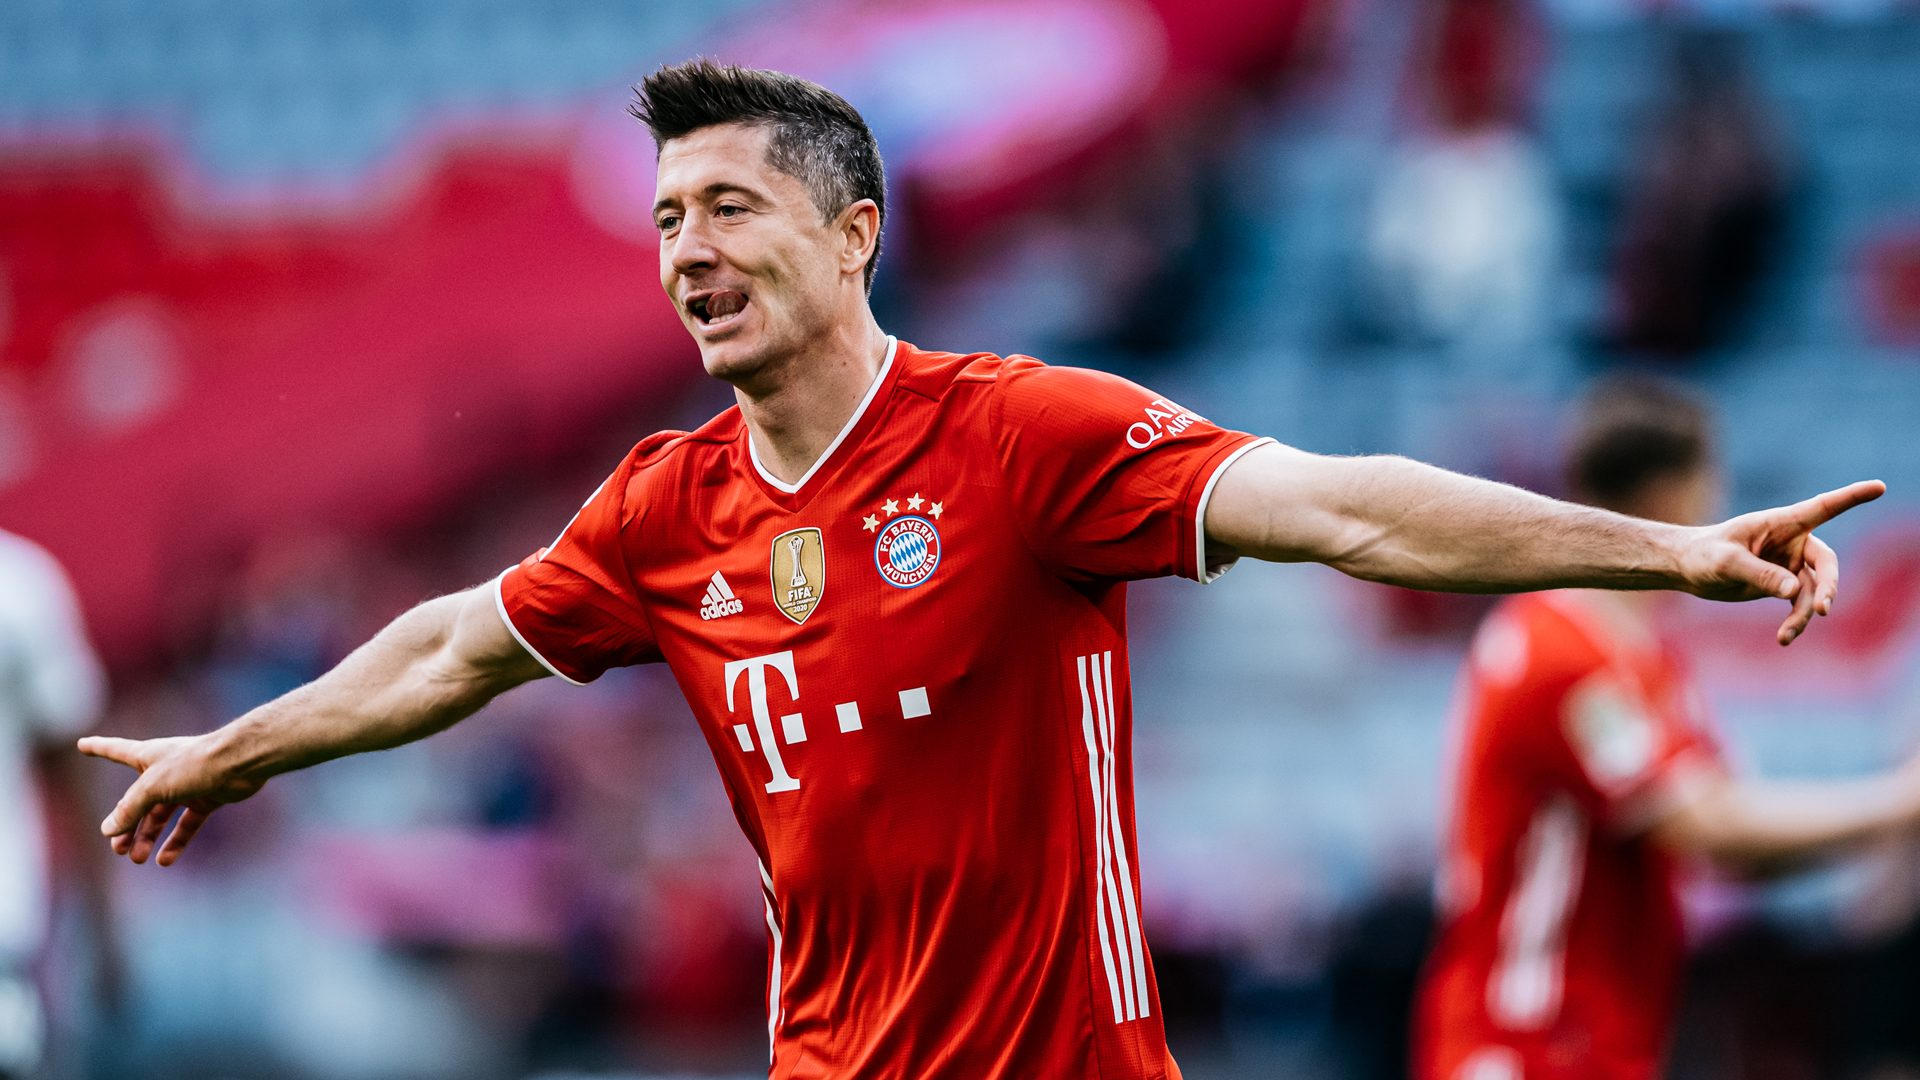 One more goal this season will see Robert Lewandowski break Gerd Muller's record